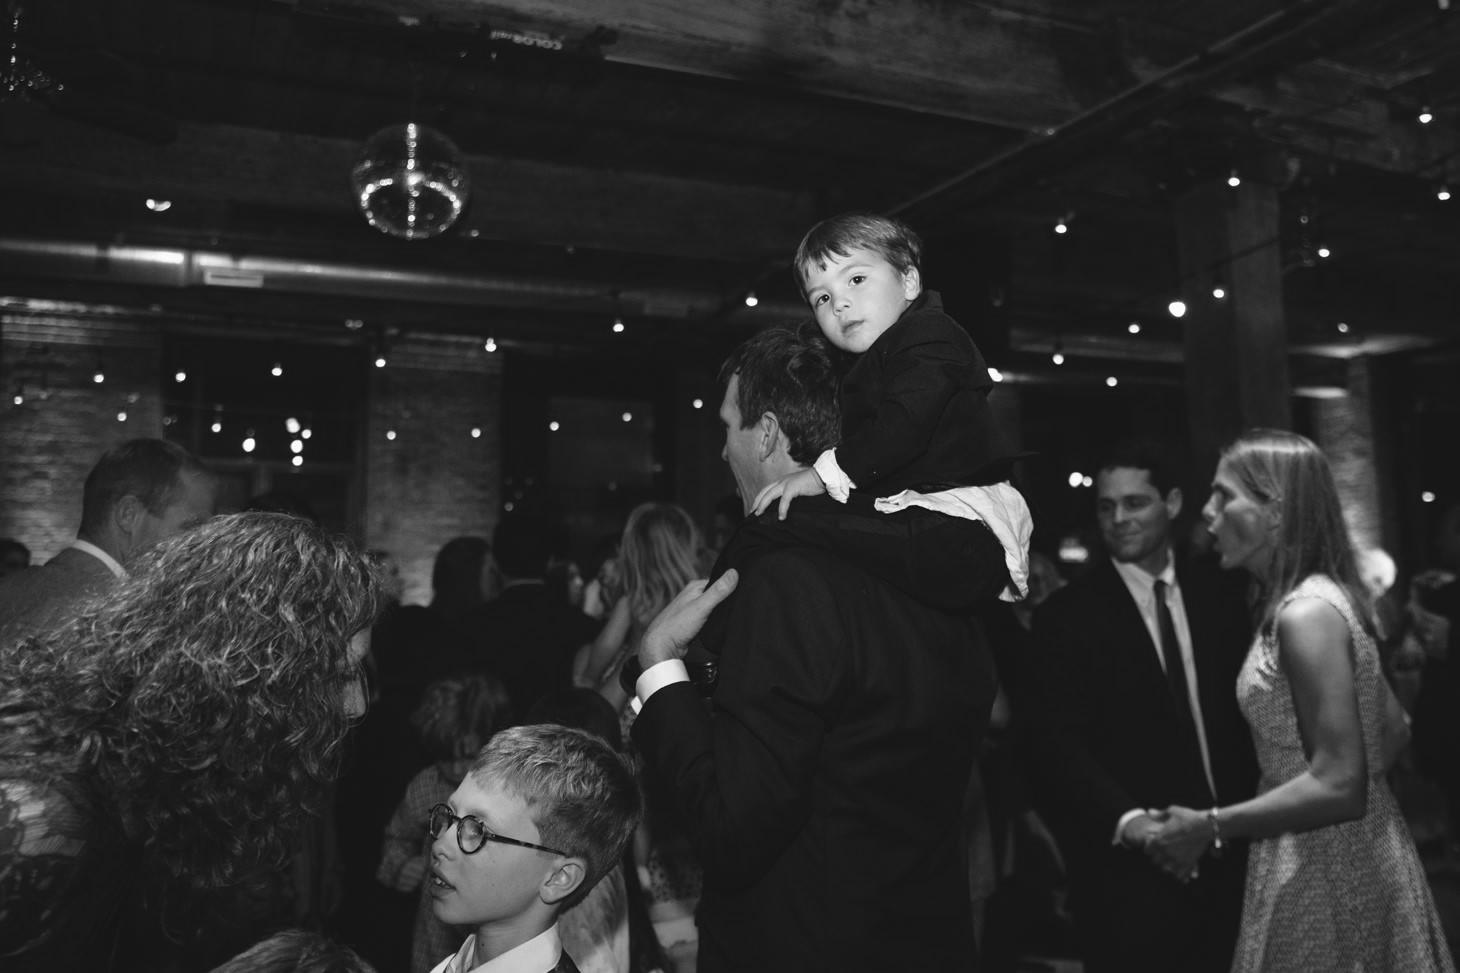 051-nyc-dumbo-loft-brooklyn-wedding-photographer-smitten-chickens-photo-.jpg